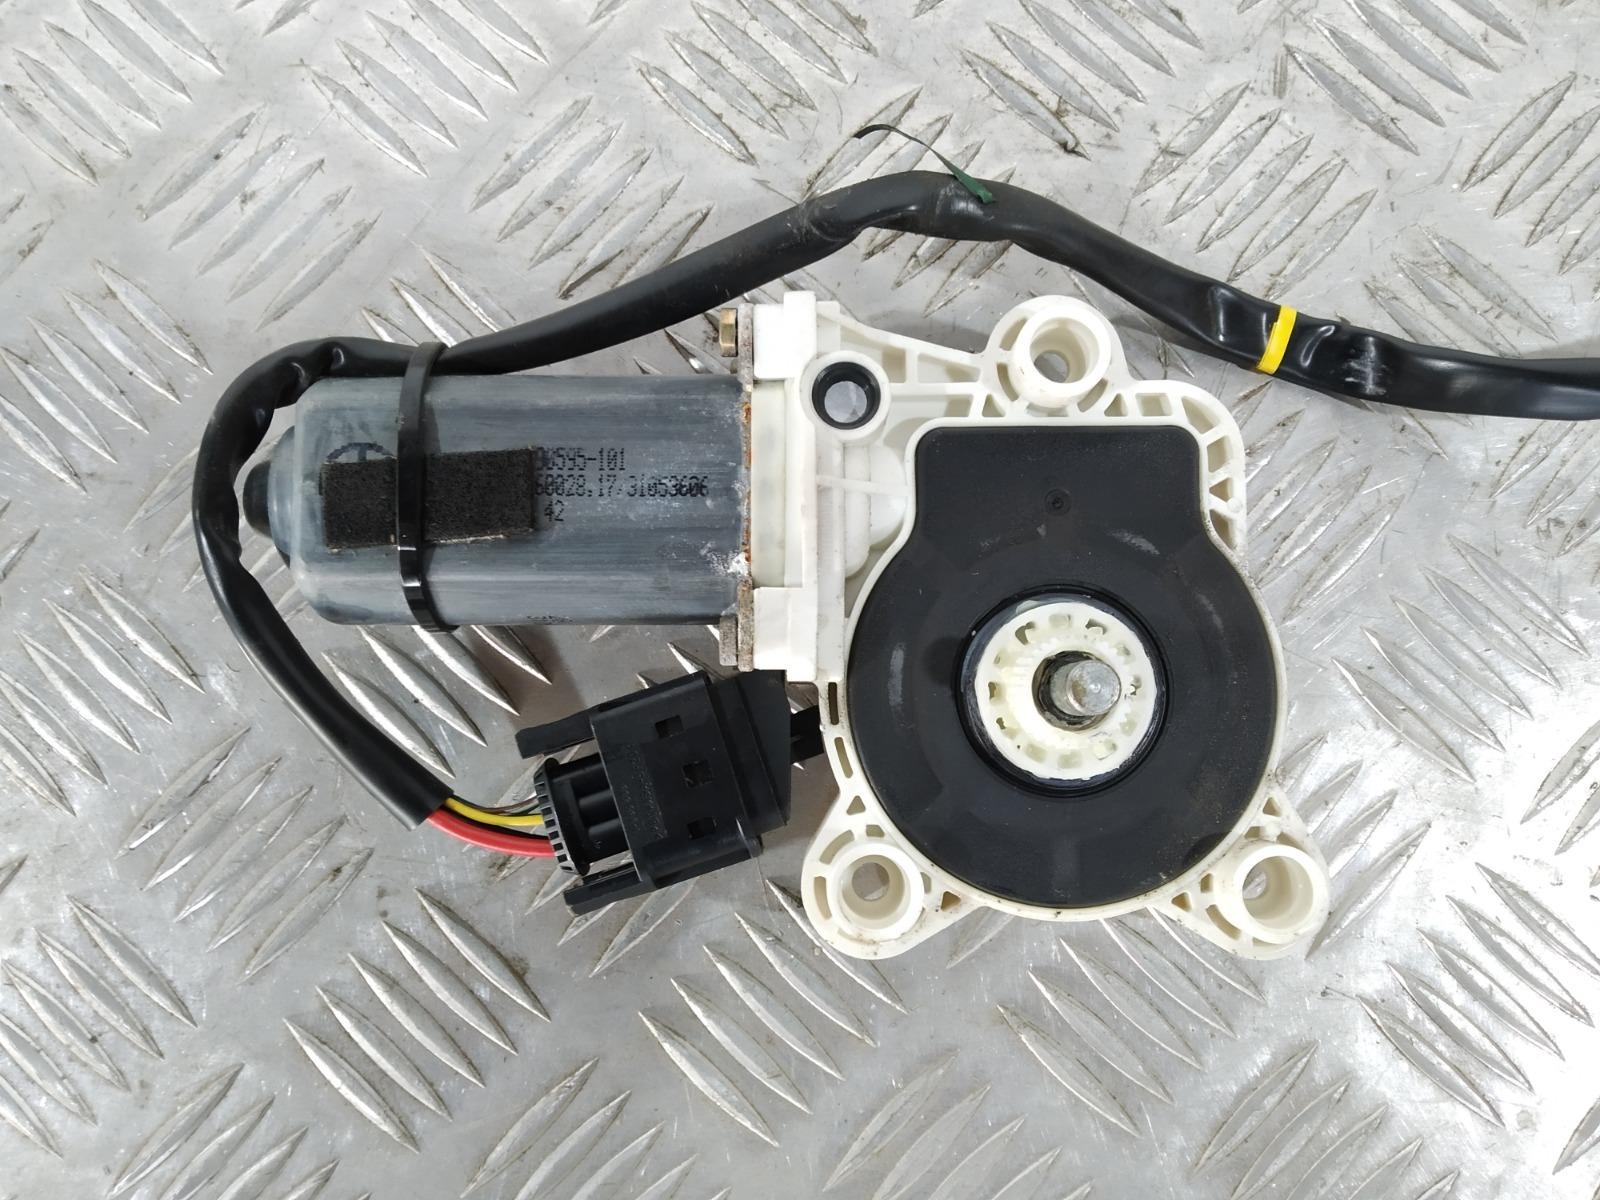 Моторчик стеклоподъемника передний левый Mercedes S W220 3.7 I 2003 (б/у)